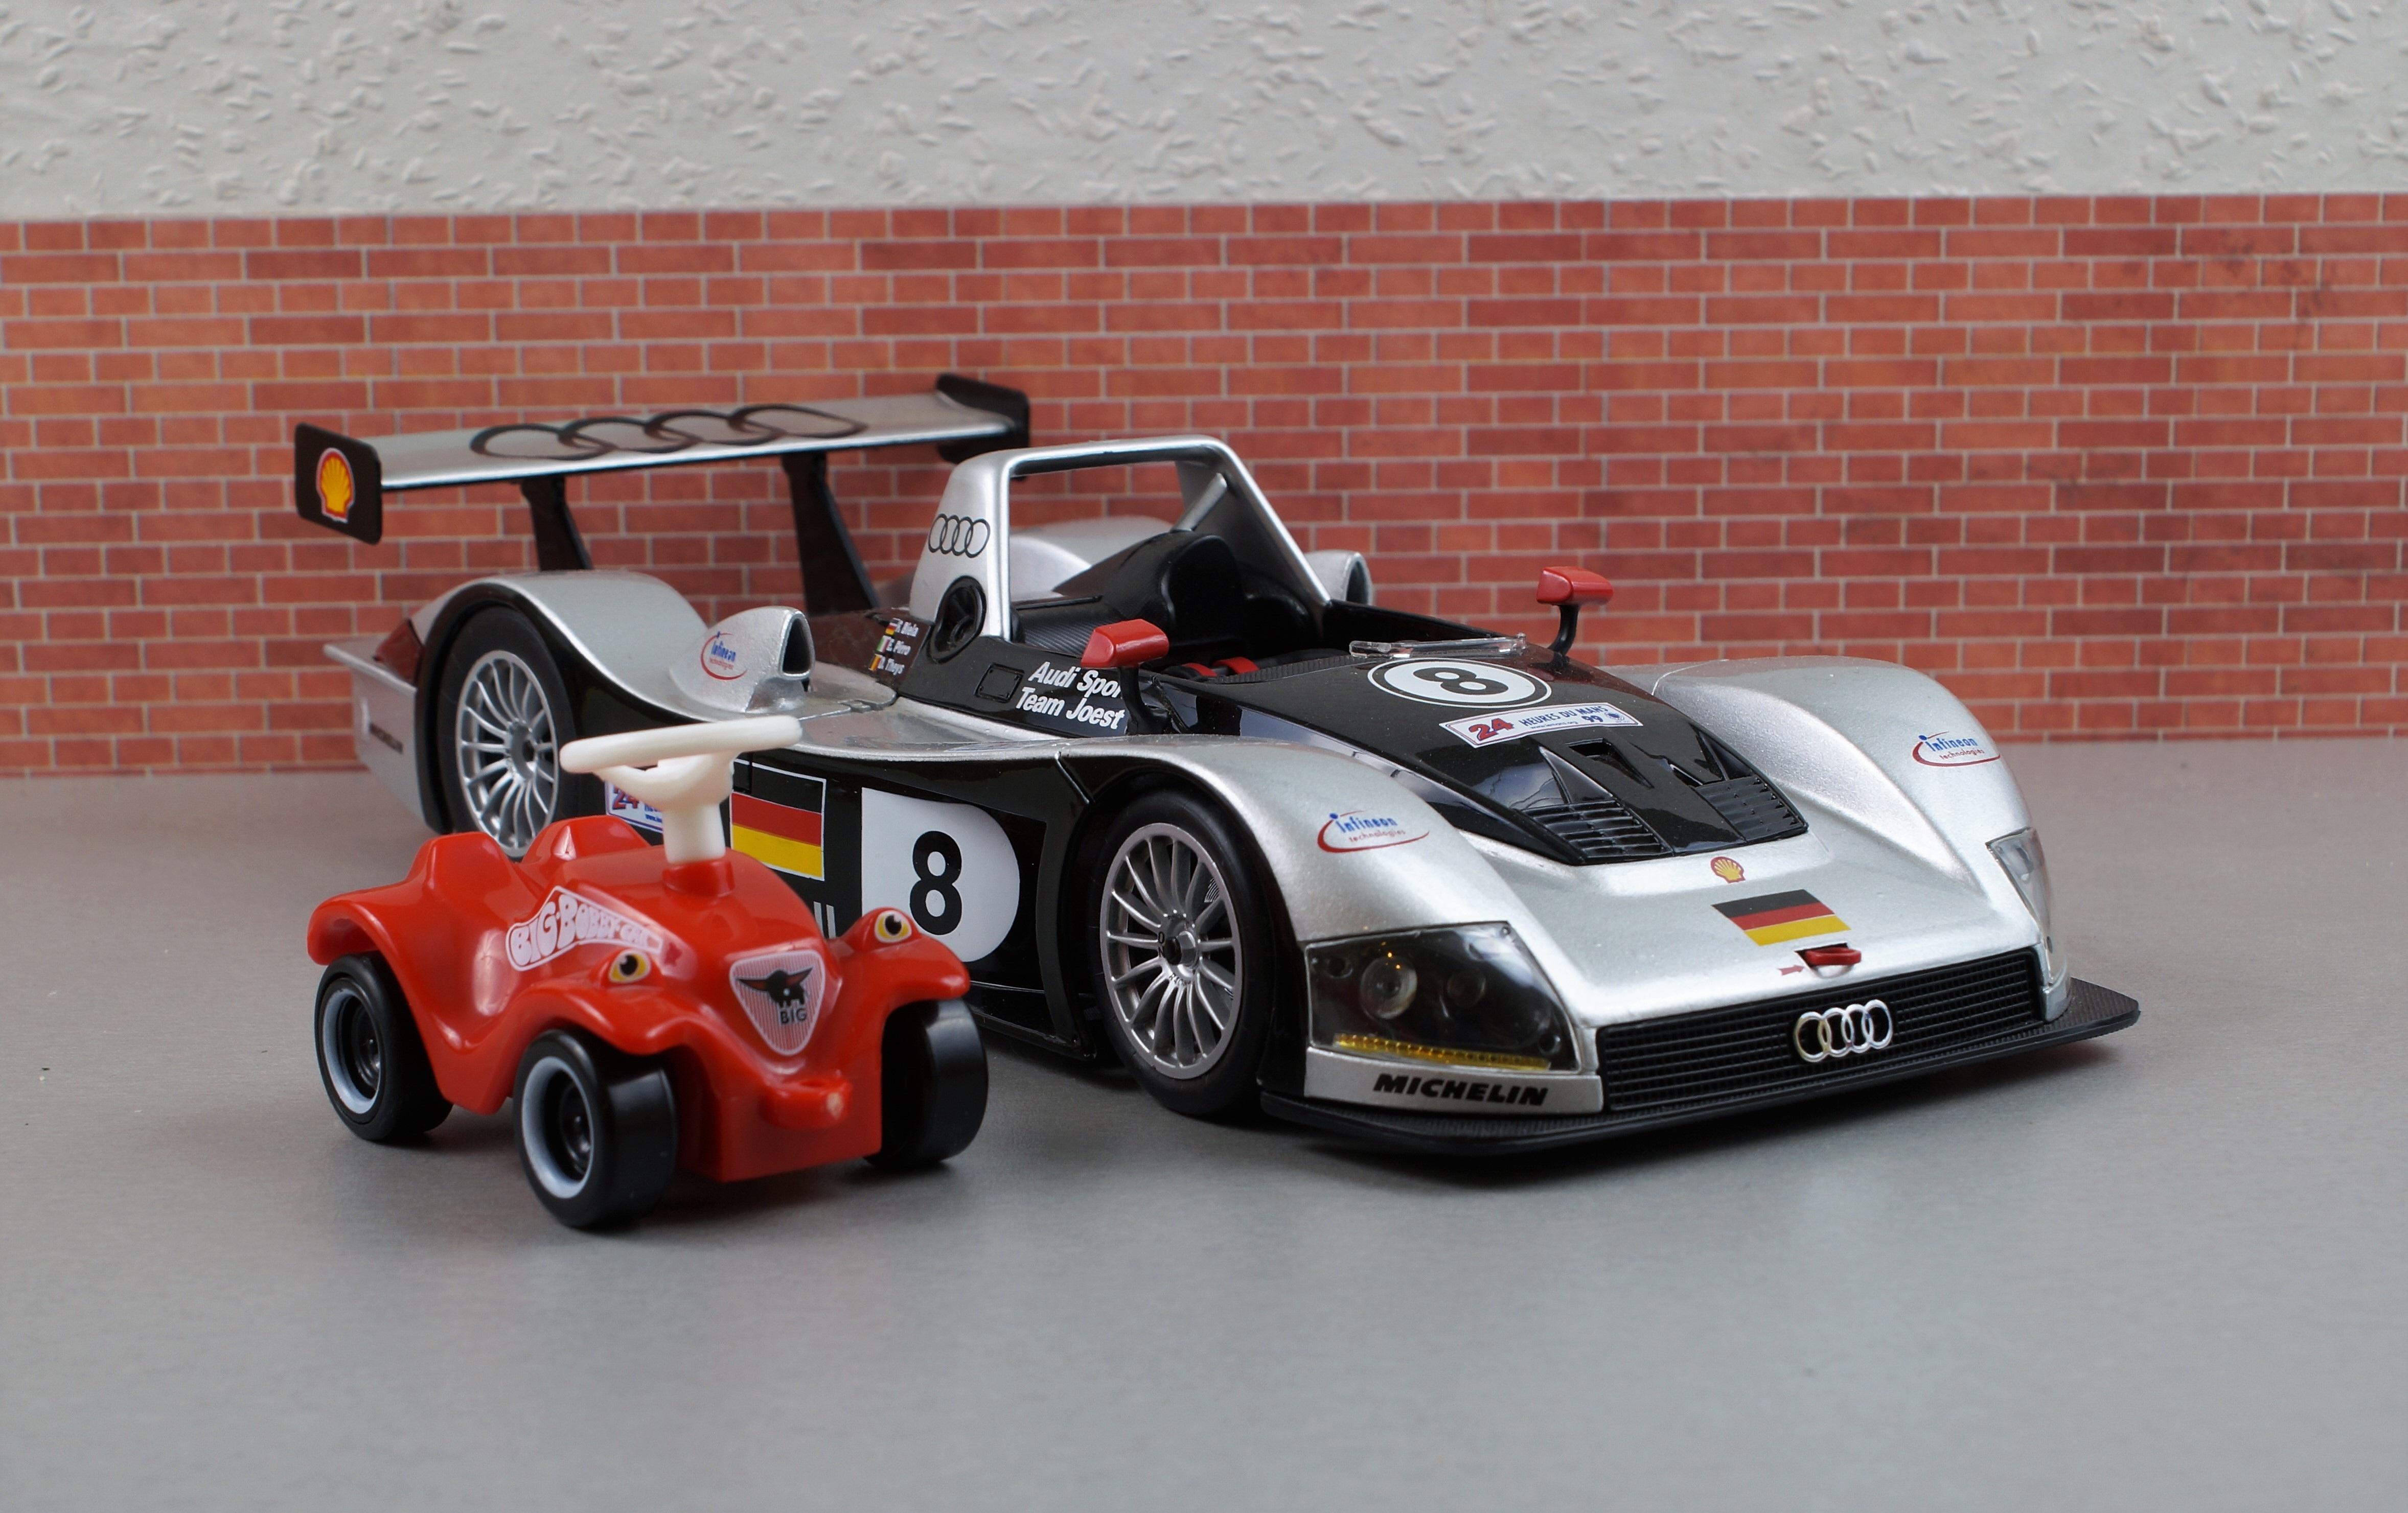 mesmerizing audi toy car models aratorn sport cars. Black Bedroom Furniture Sets. Home Design Ideas